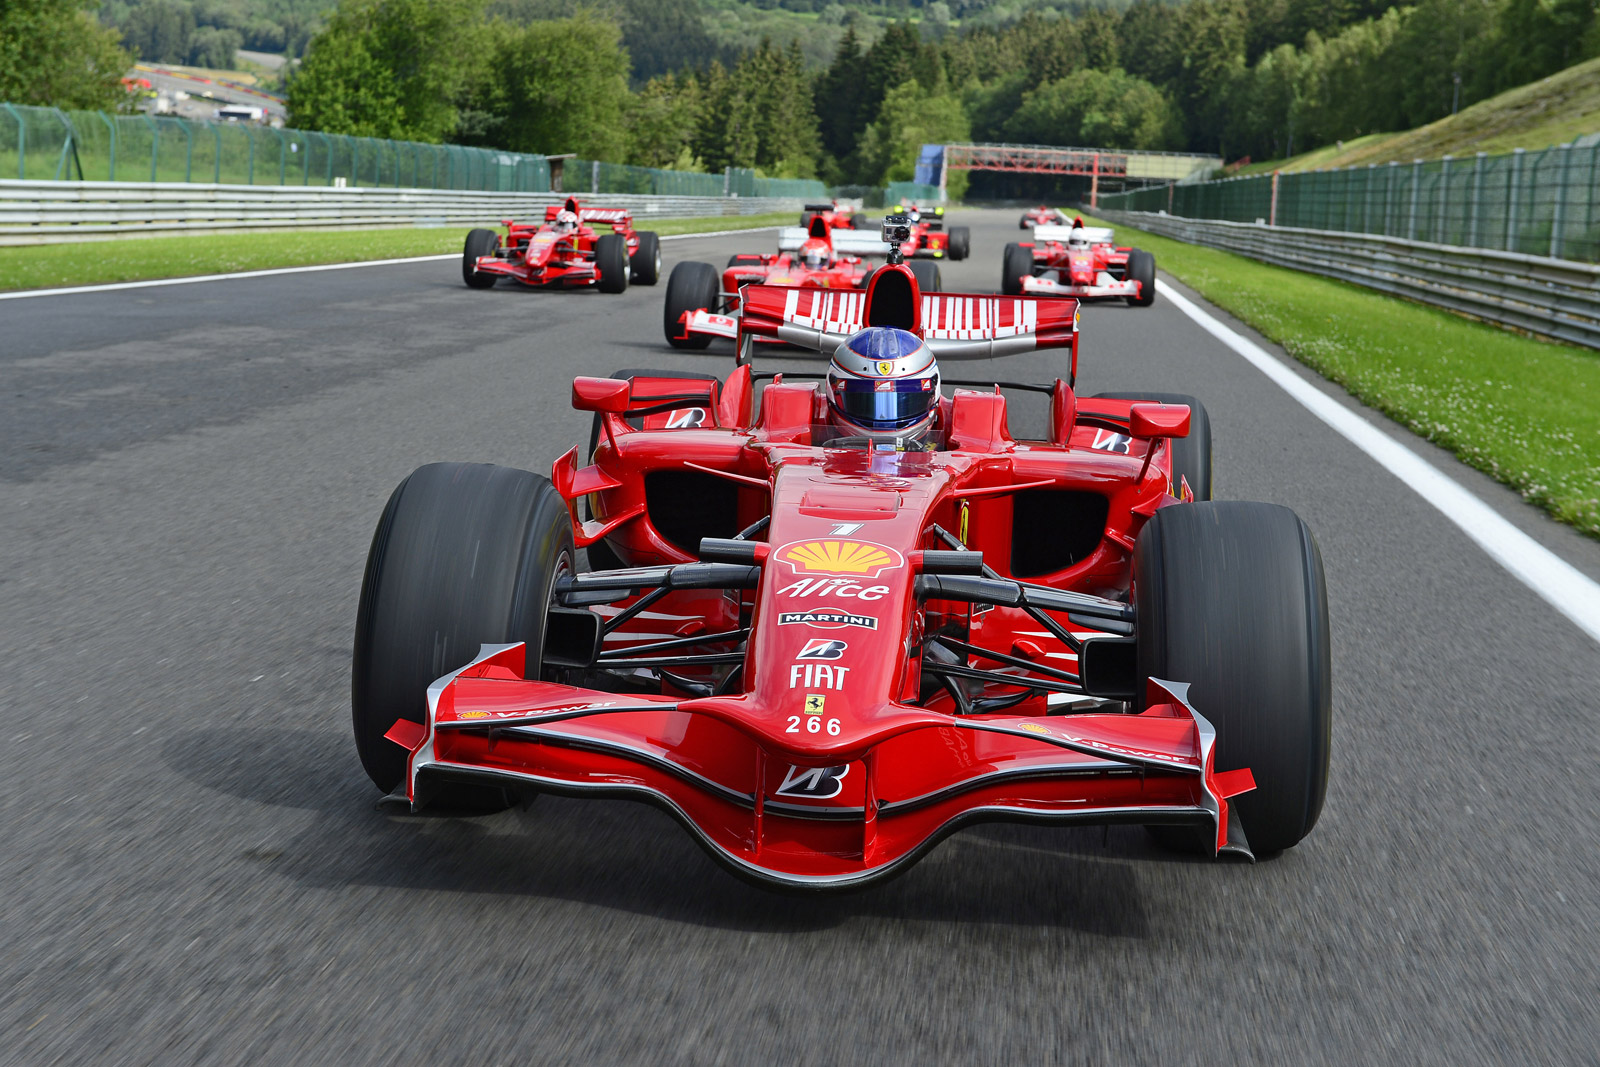 Ferrari Forms New Sporting Activities Department